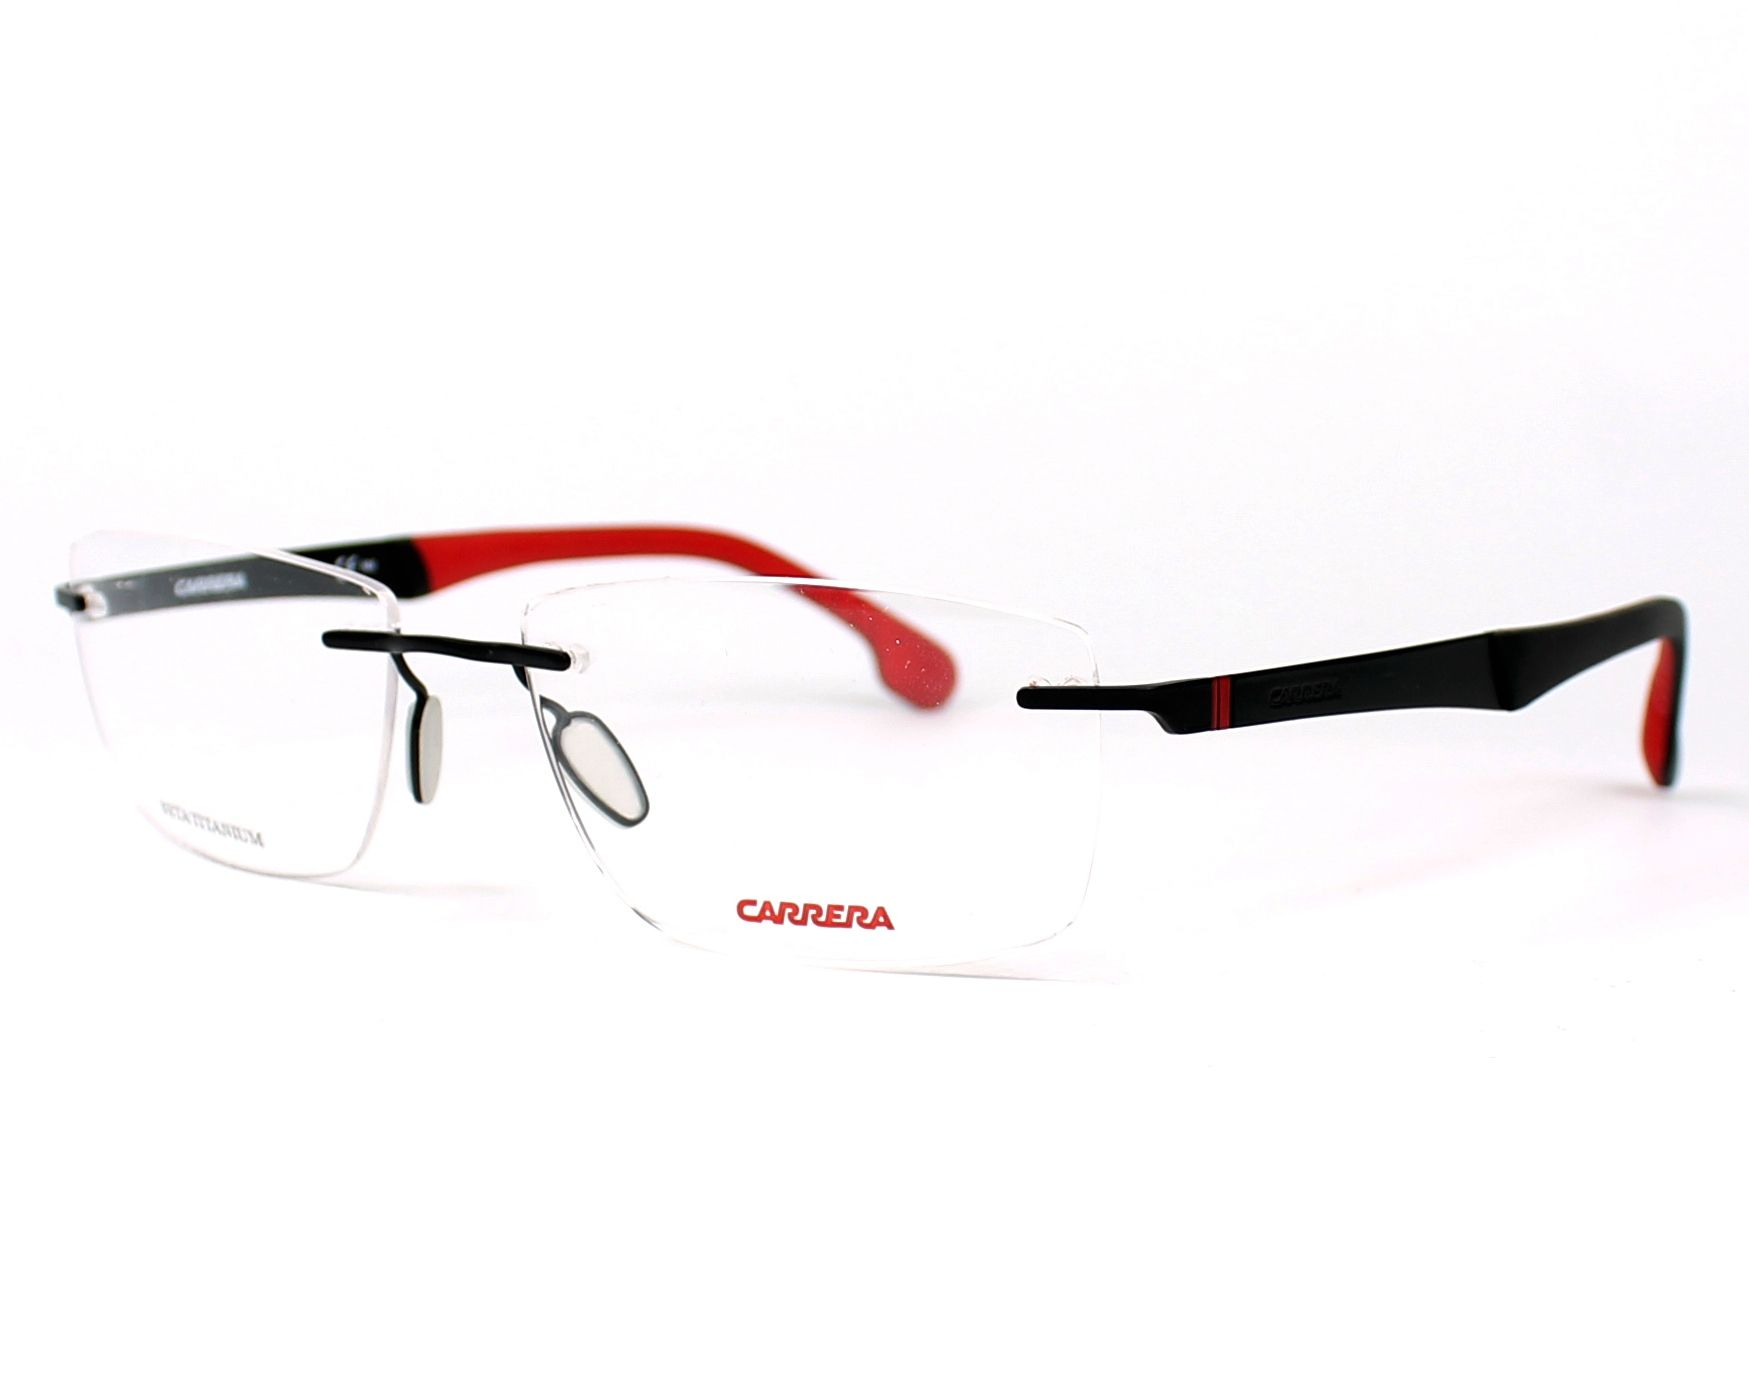 e8d62a30cf Get Free Shipping on Carrera Eyeglasses 8823 V